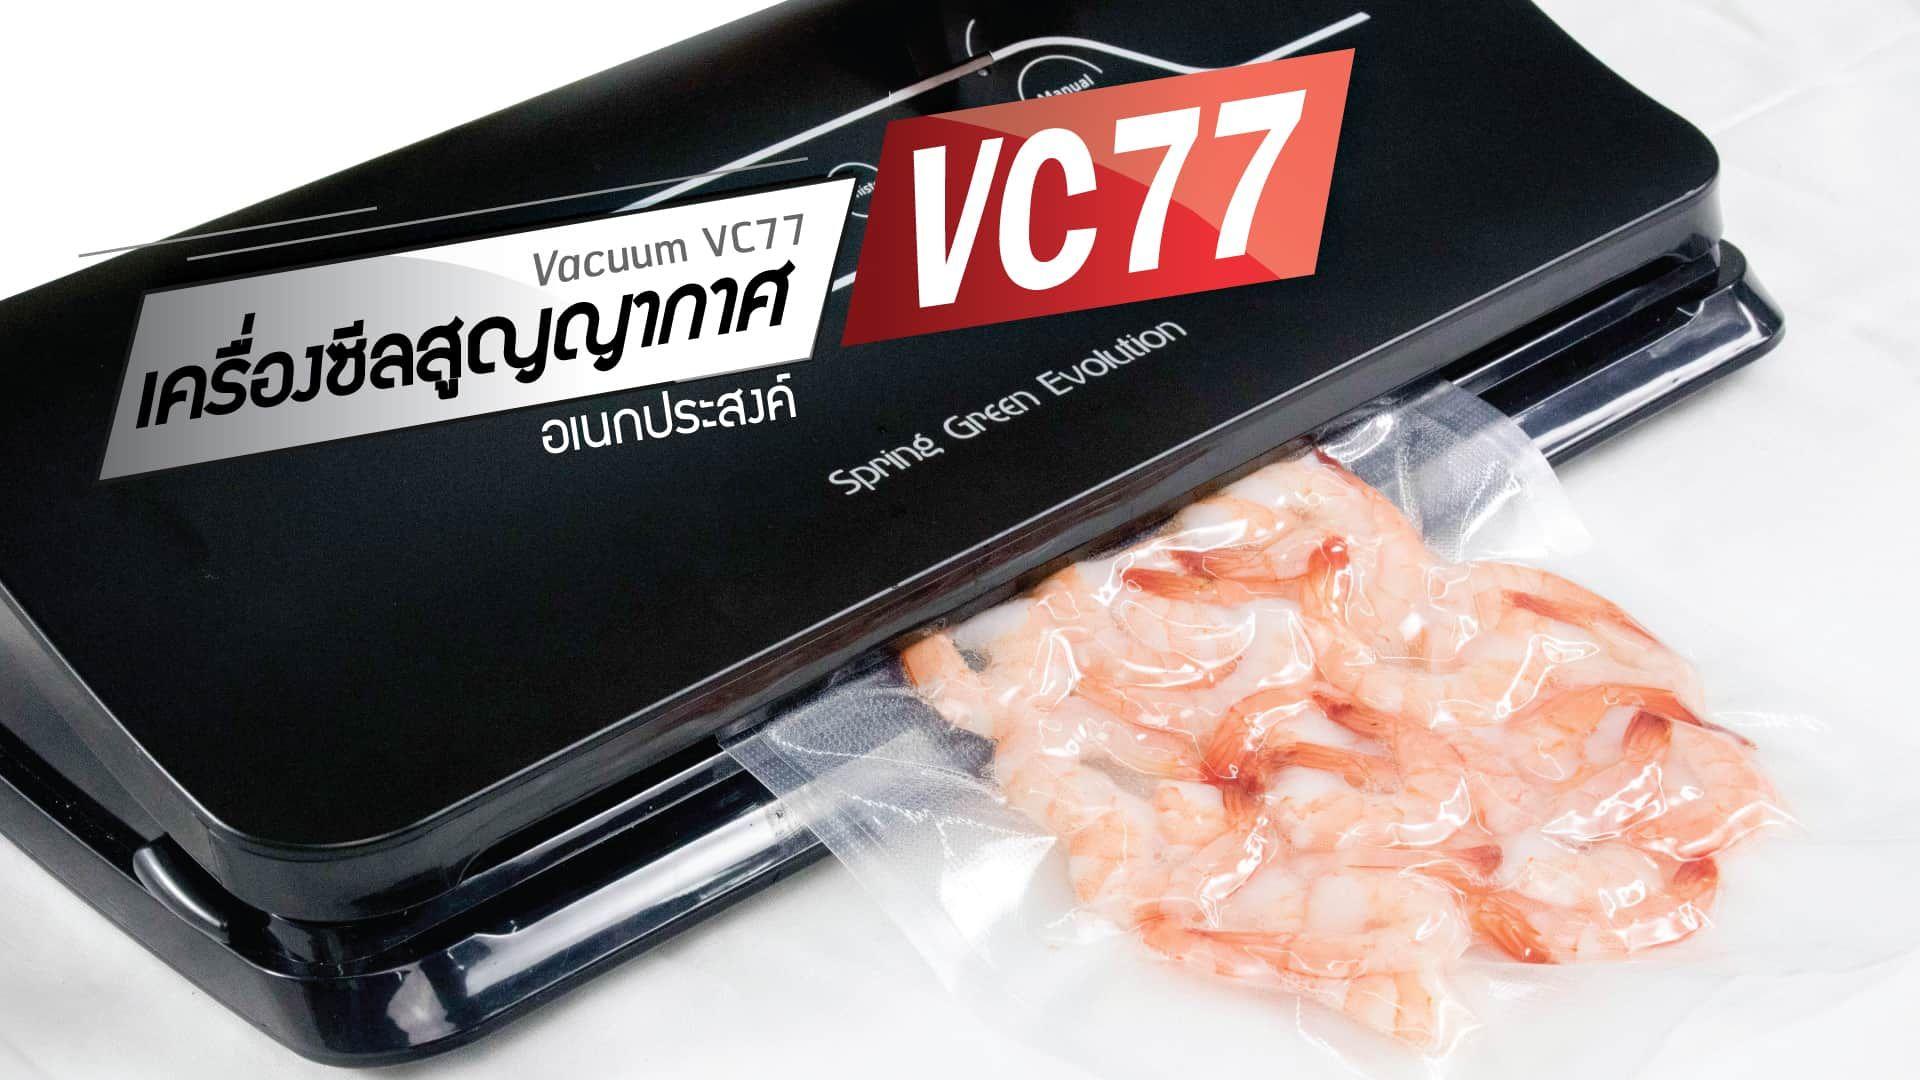 vacuum-sealer-vc77-edit-4